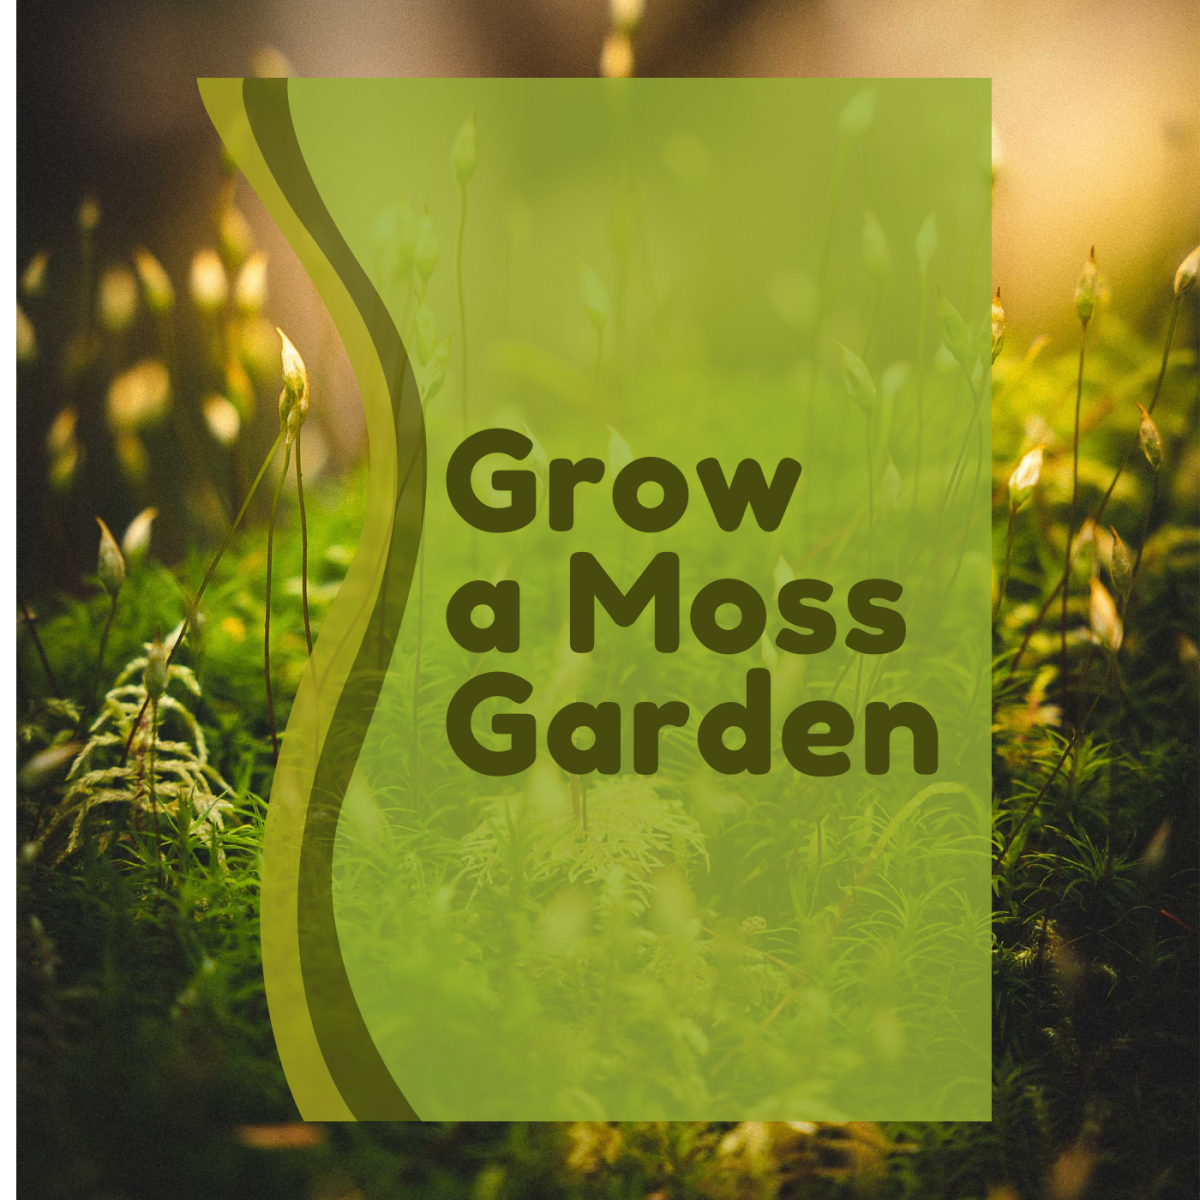 Learn how to propagate a moss garden.